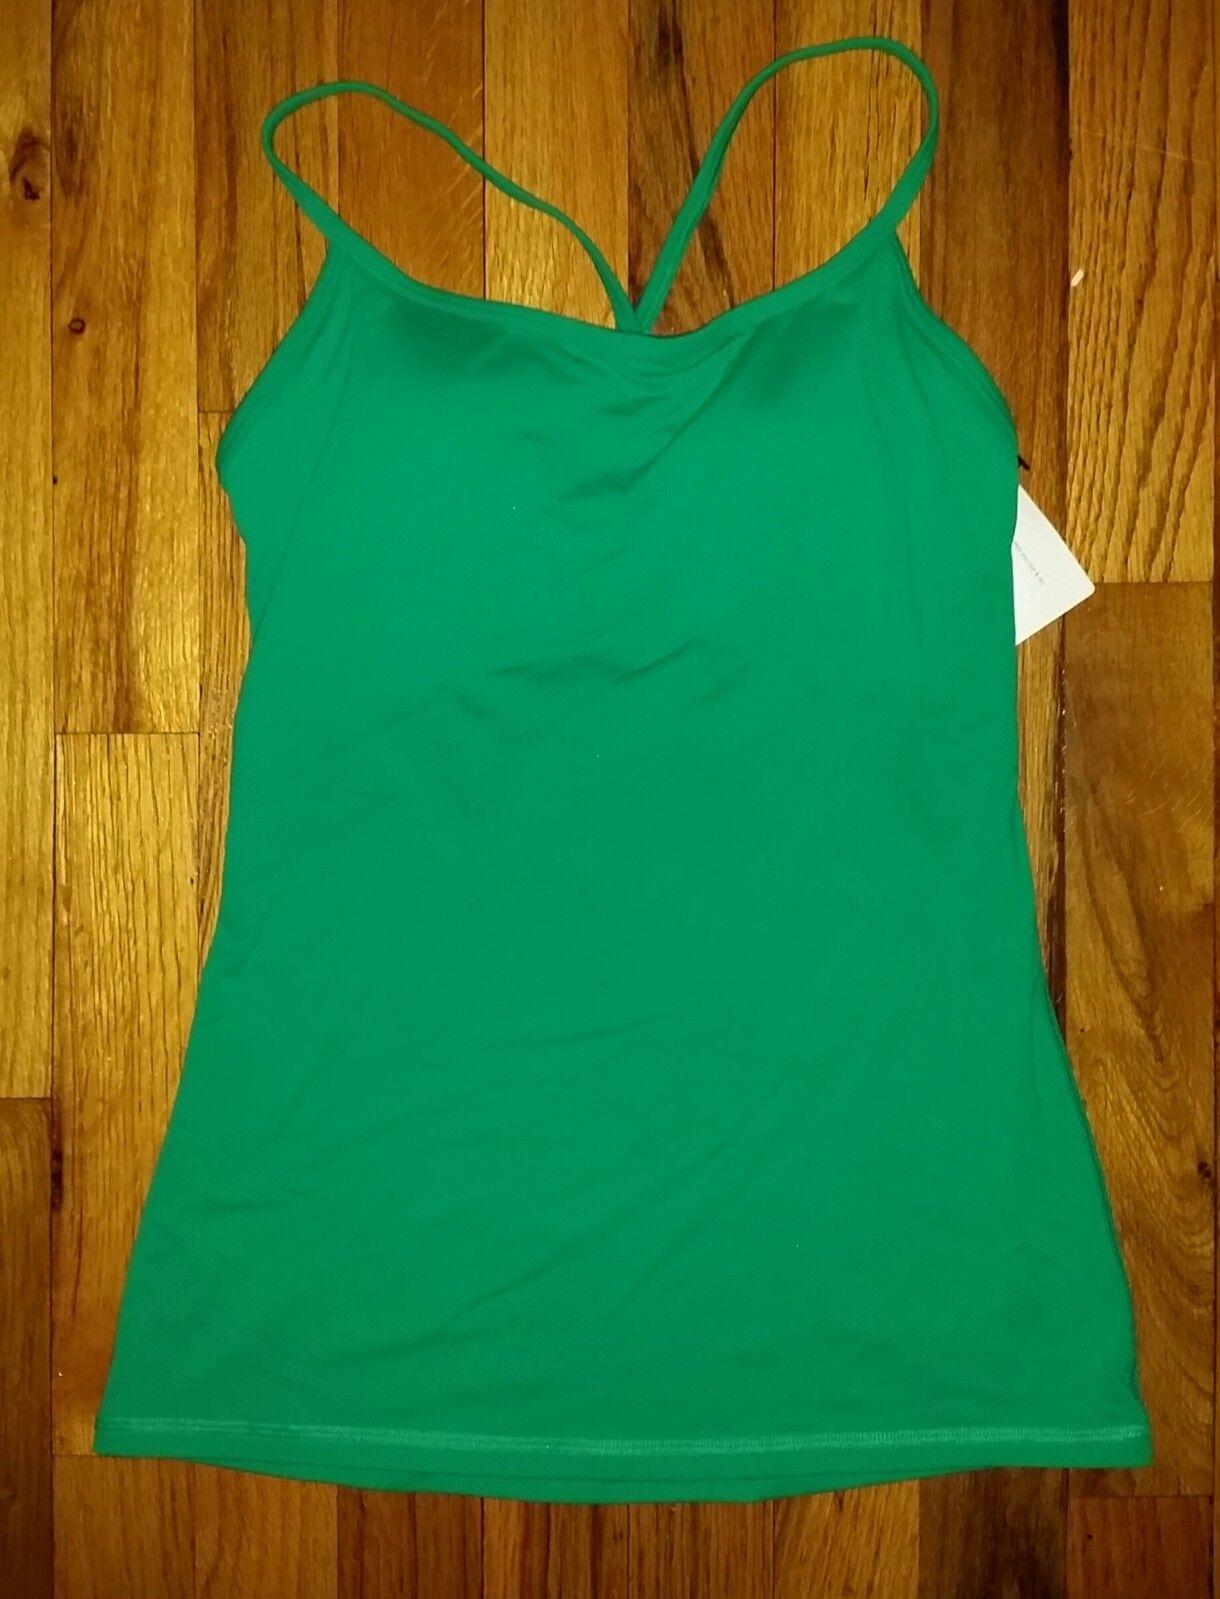 Victoria's Secret VSX Padded Green Top XS - NWT